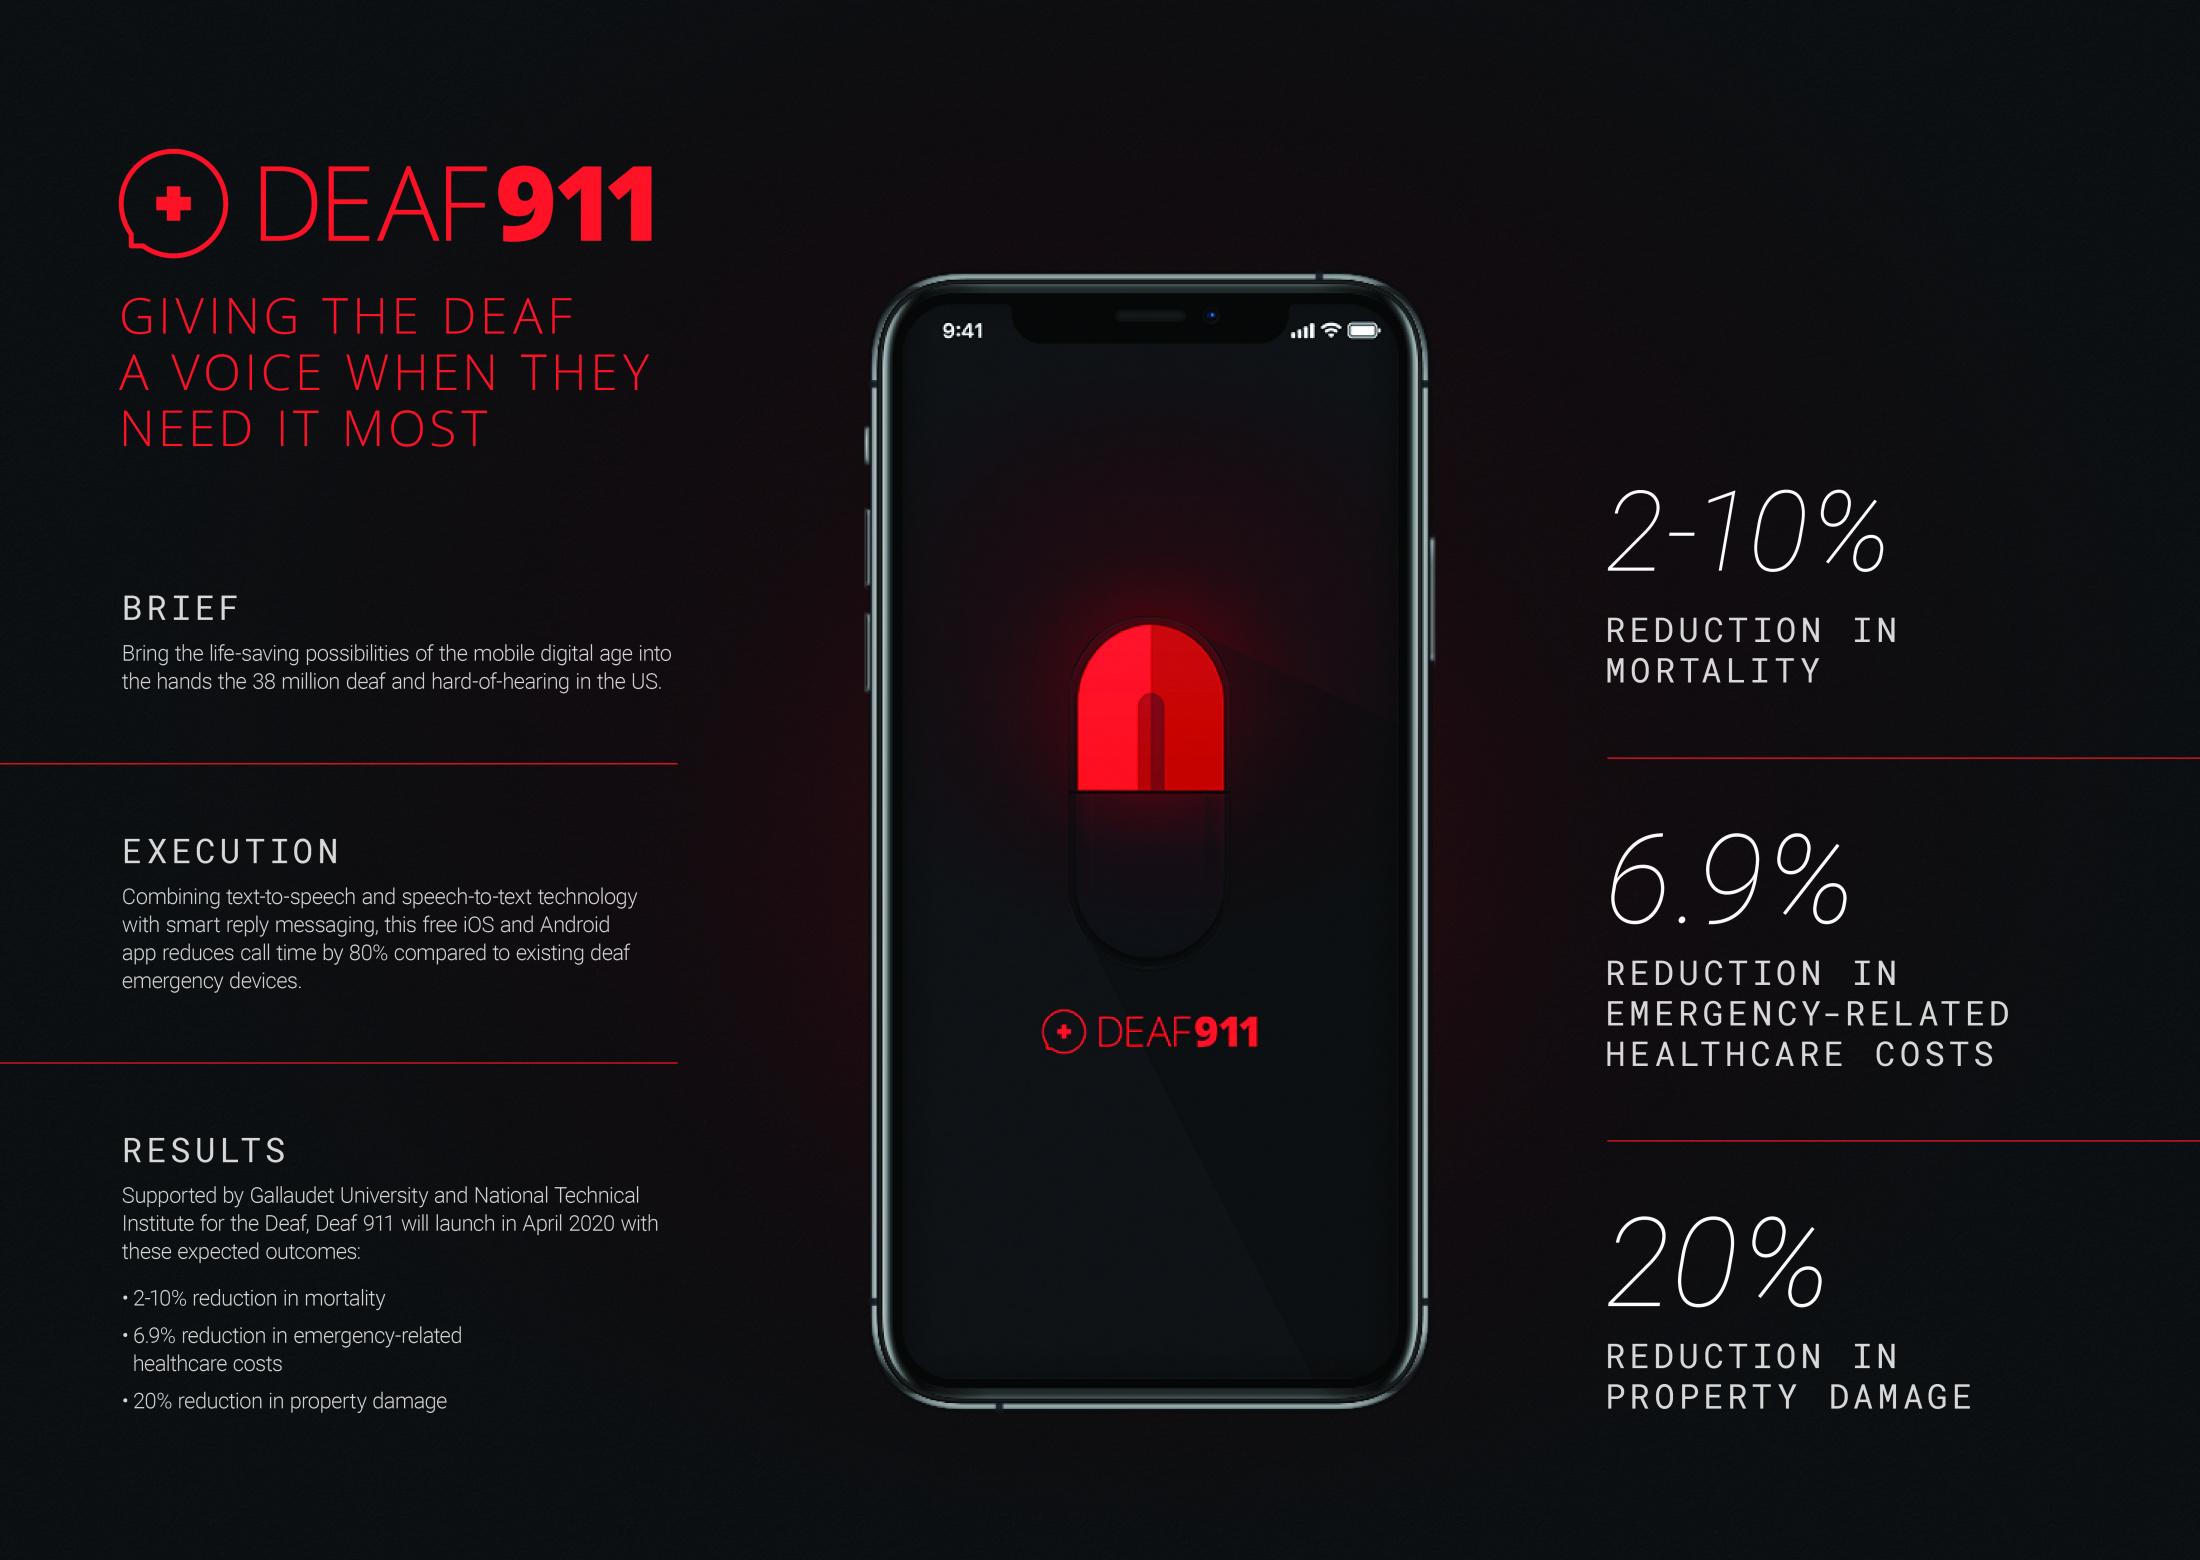 Deaf 911 Mobile App Thumbnail